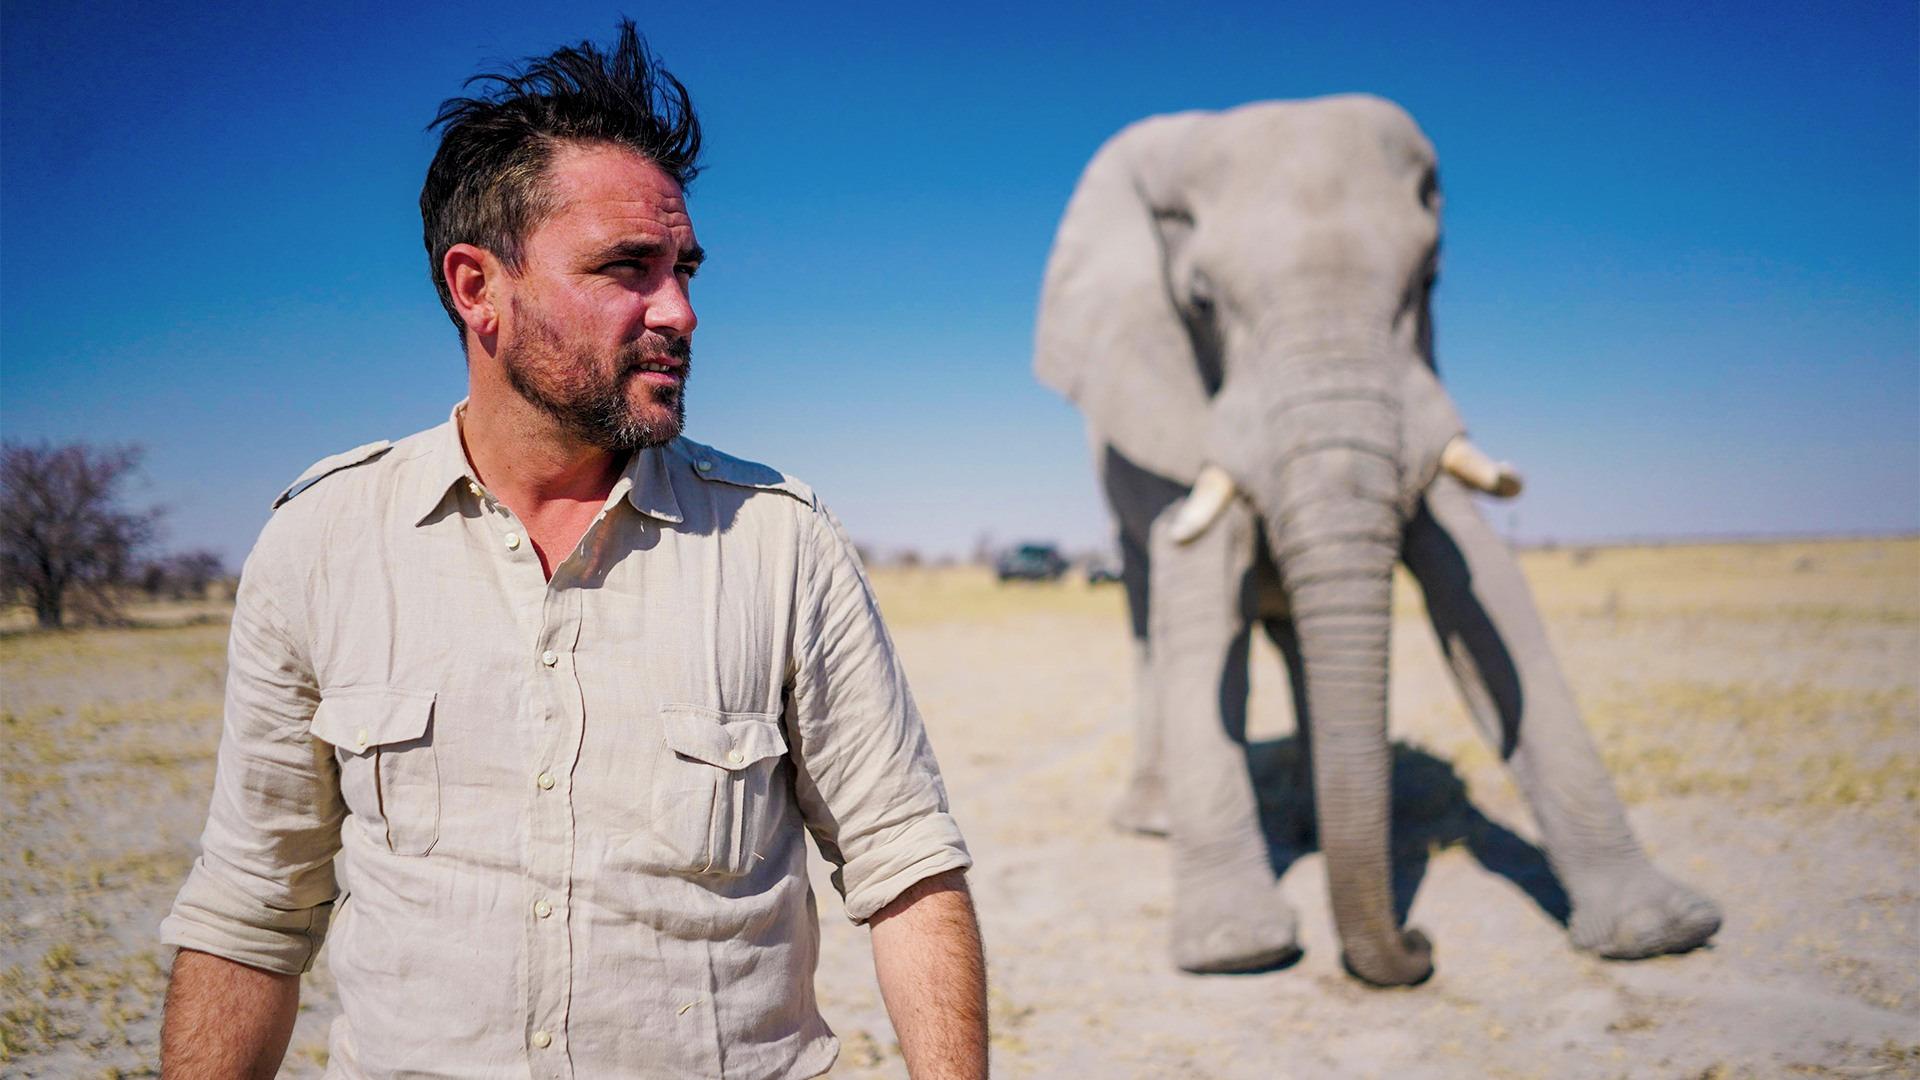 Show Walking with Elephants